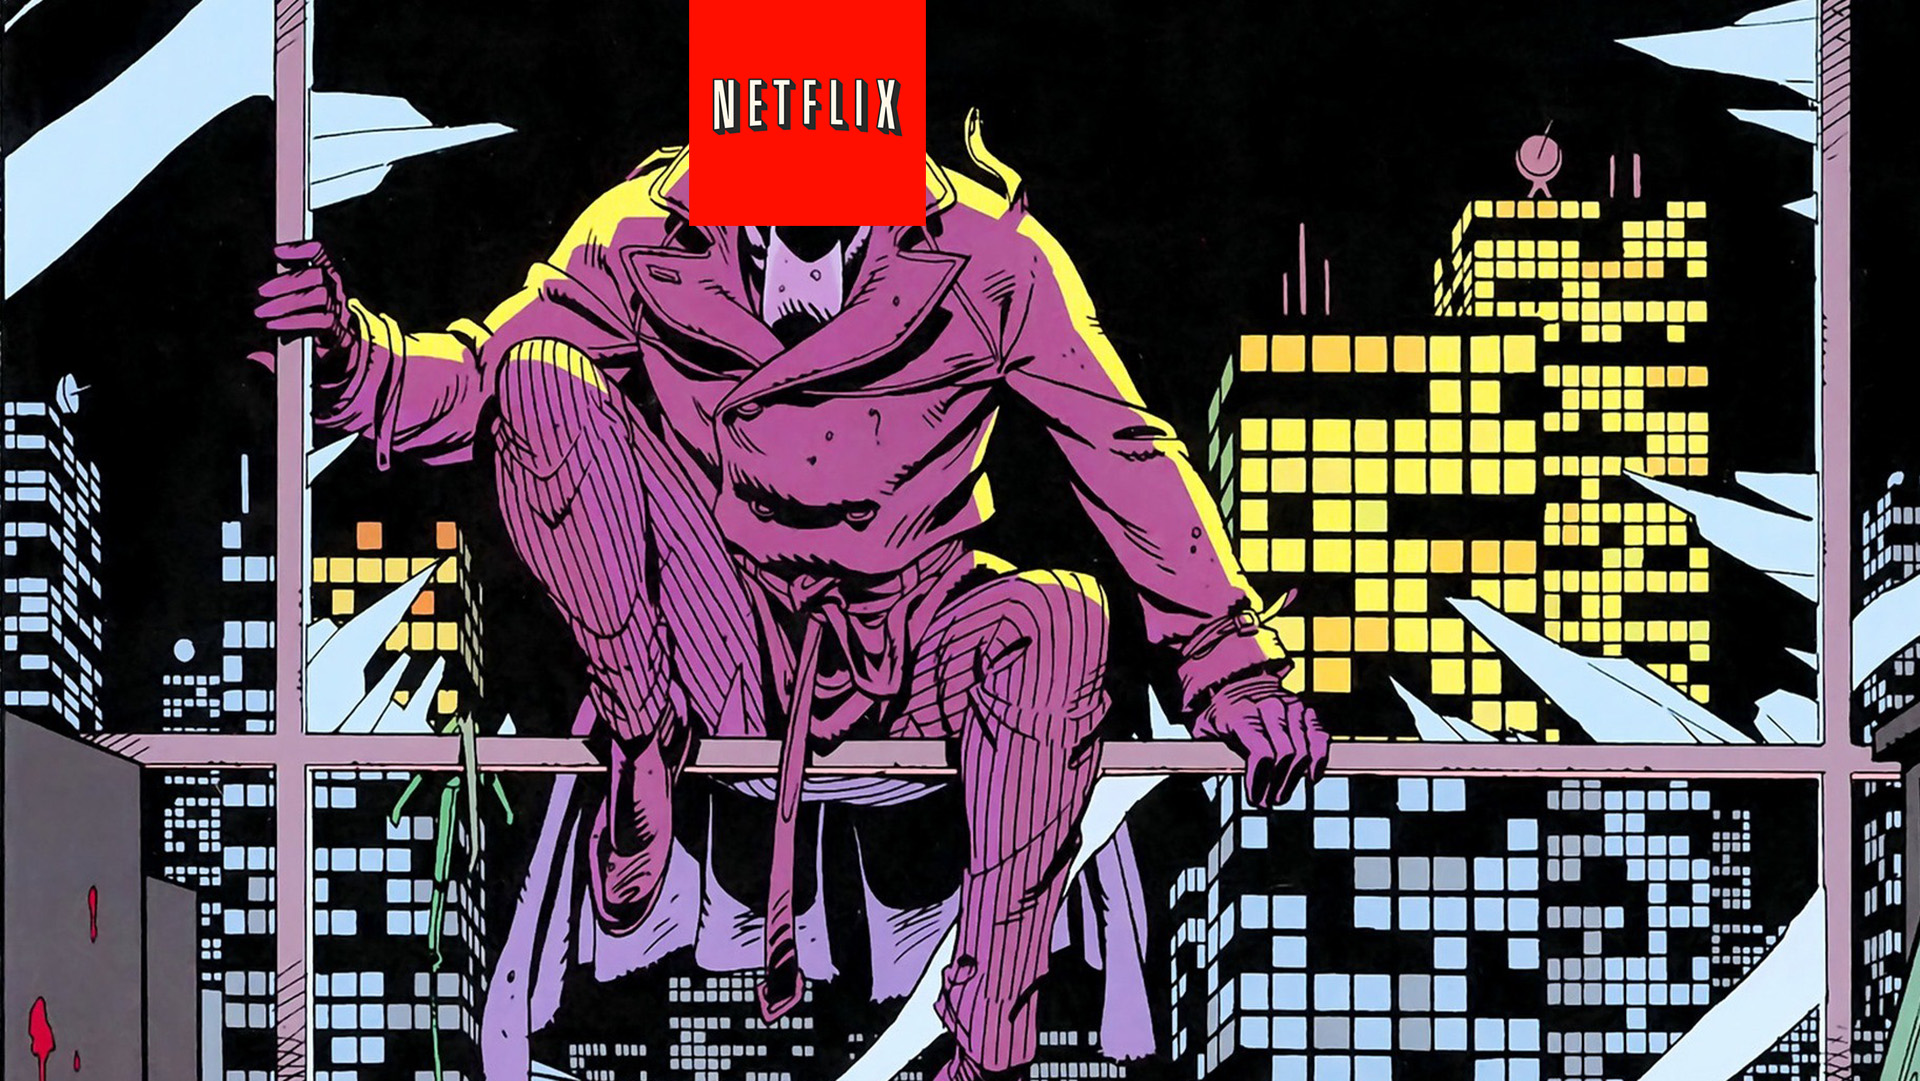 'No plans' for Netflix on the Nintendo Switch screenshot